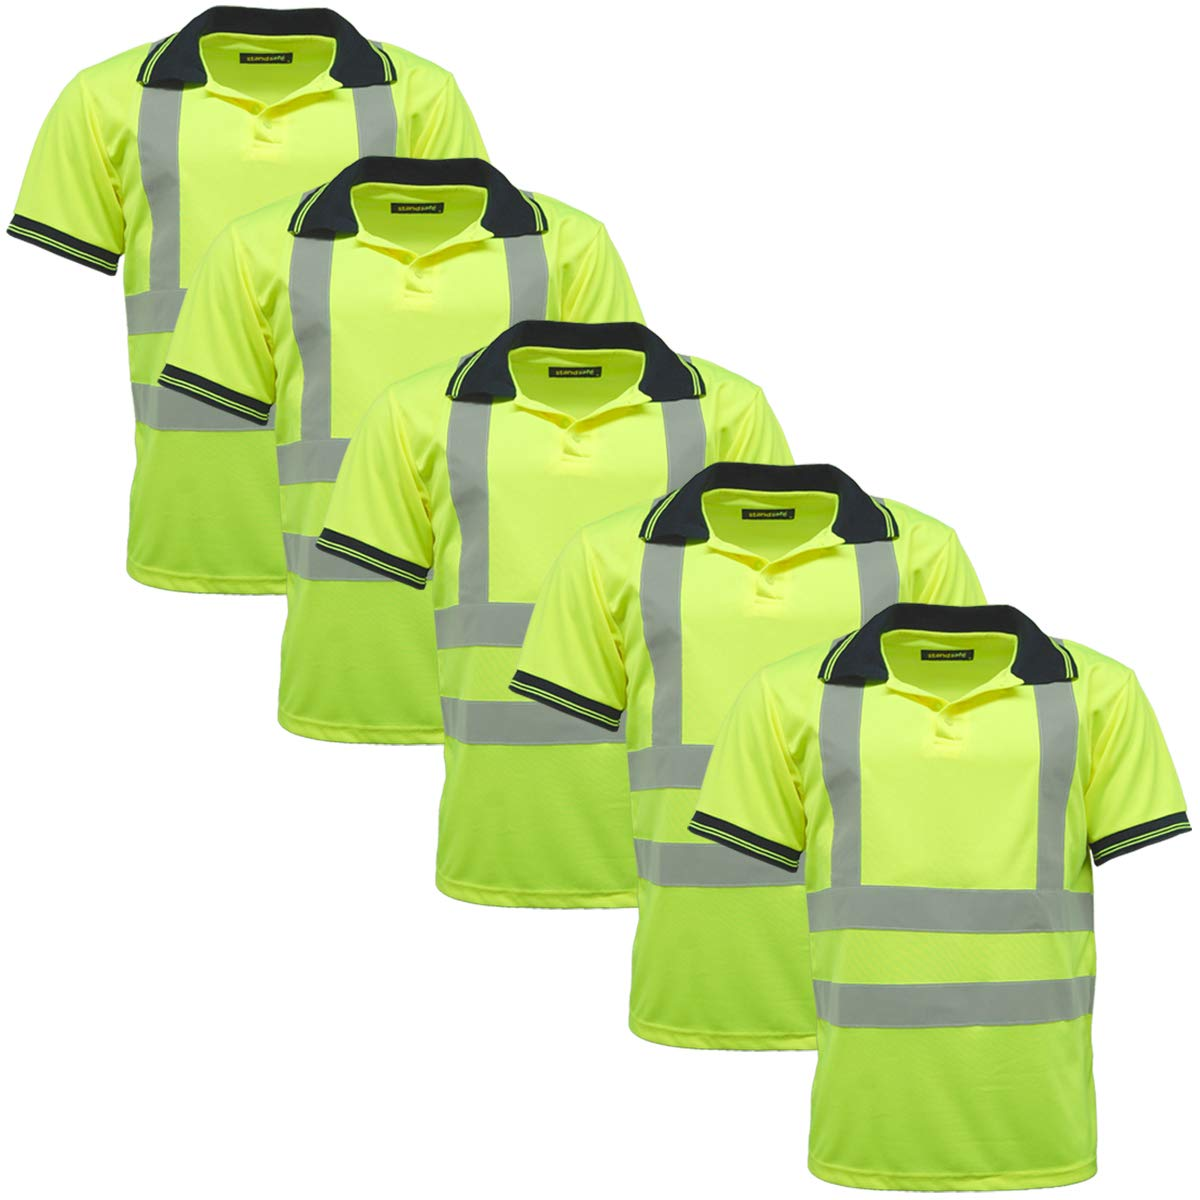 StandSafe Tops de Trabajo Reflectantes de Alta Visibilidad ...